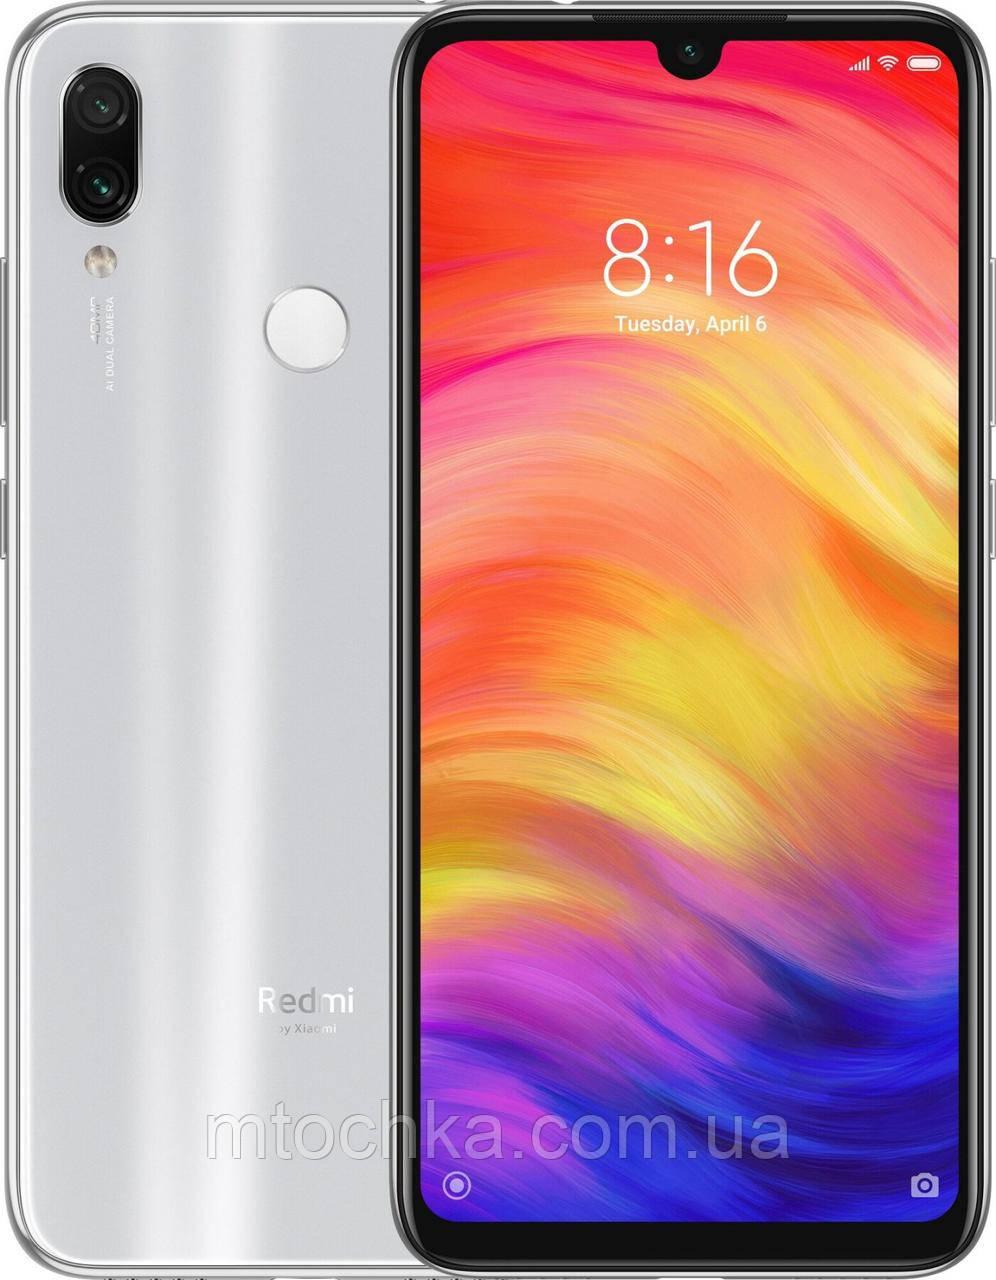 Телефон Xiaomi Redmi Note 7 4/64 GB Moonlight White